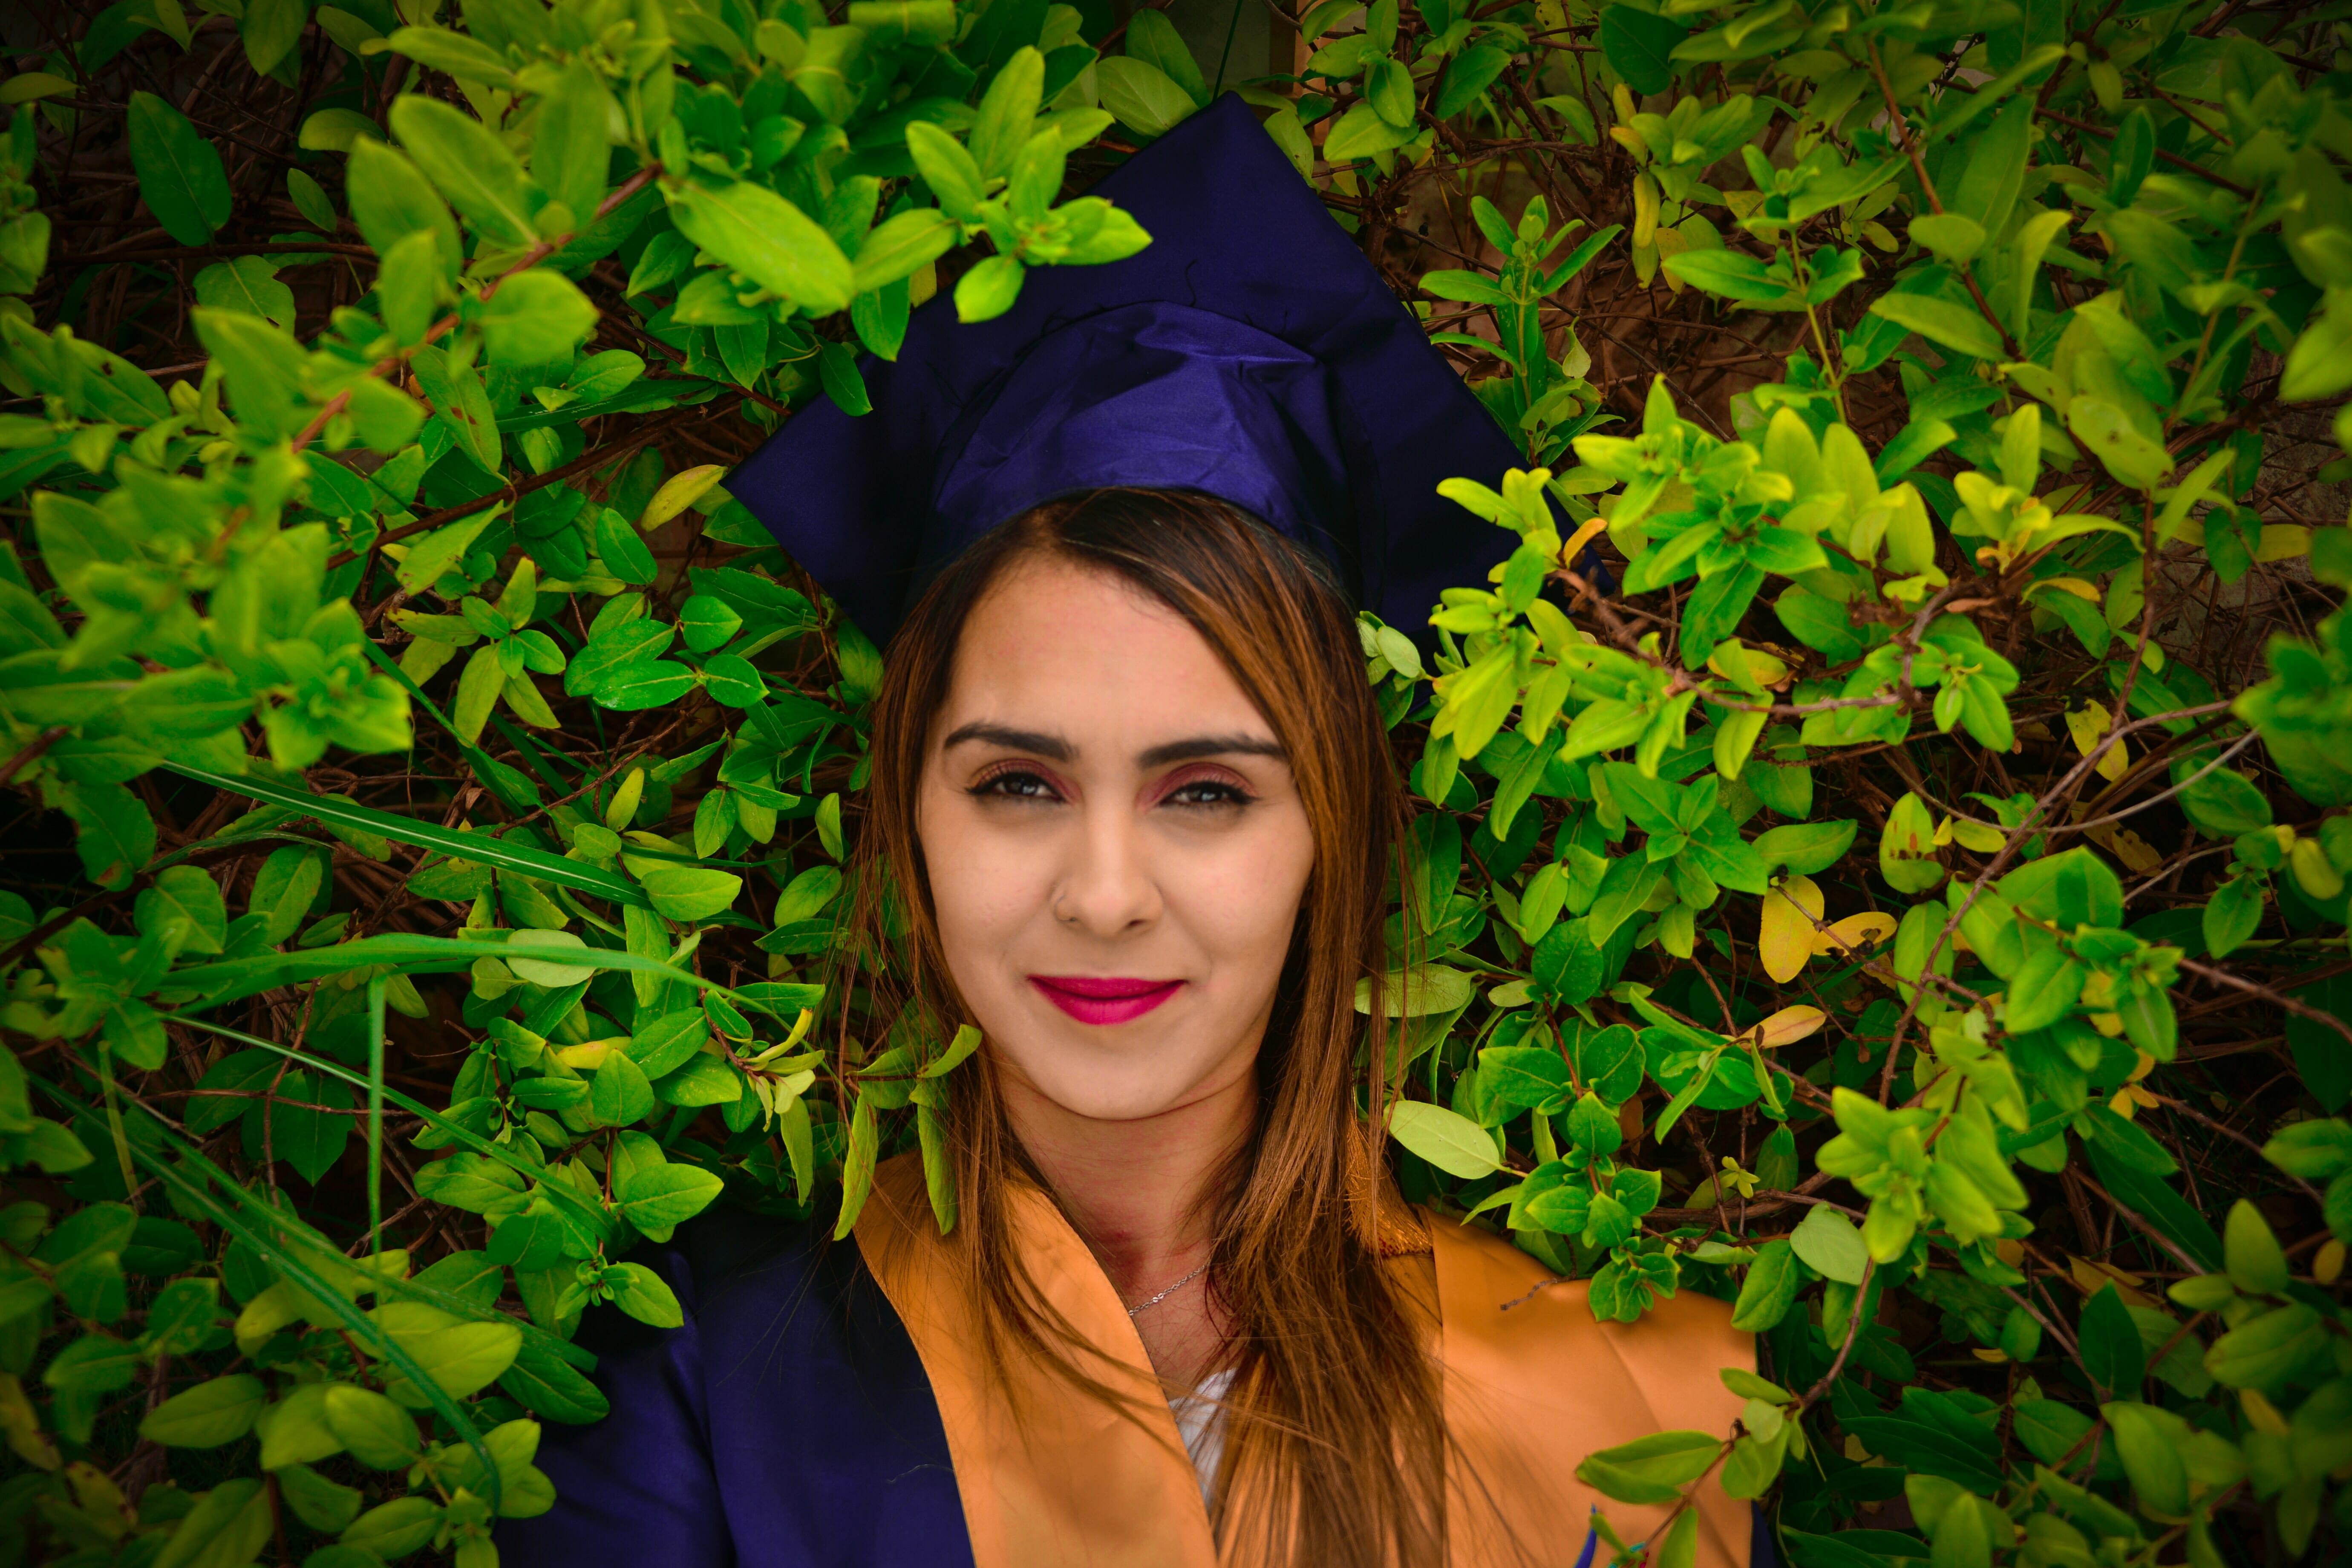 What happens at a graduation ceremony?